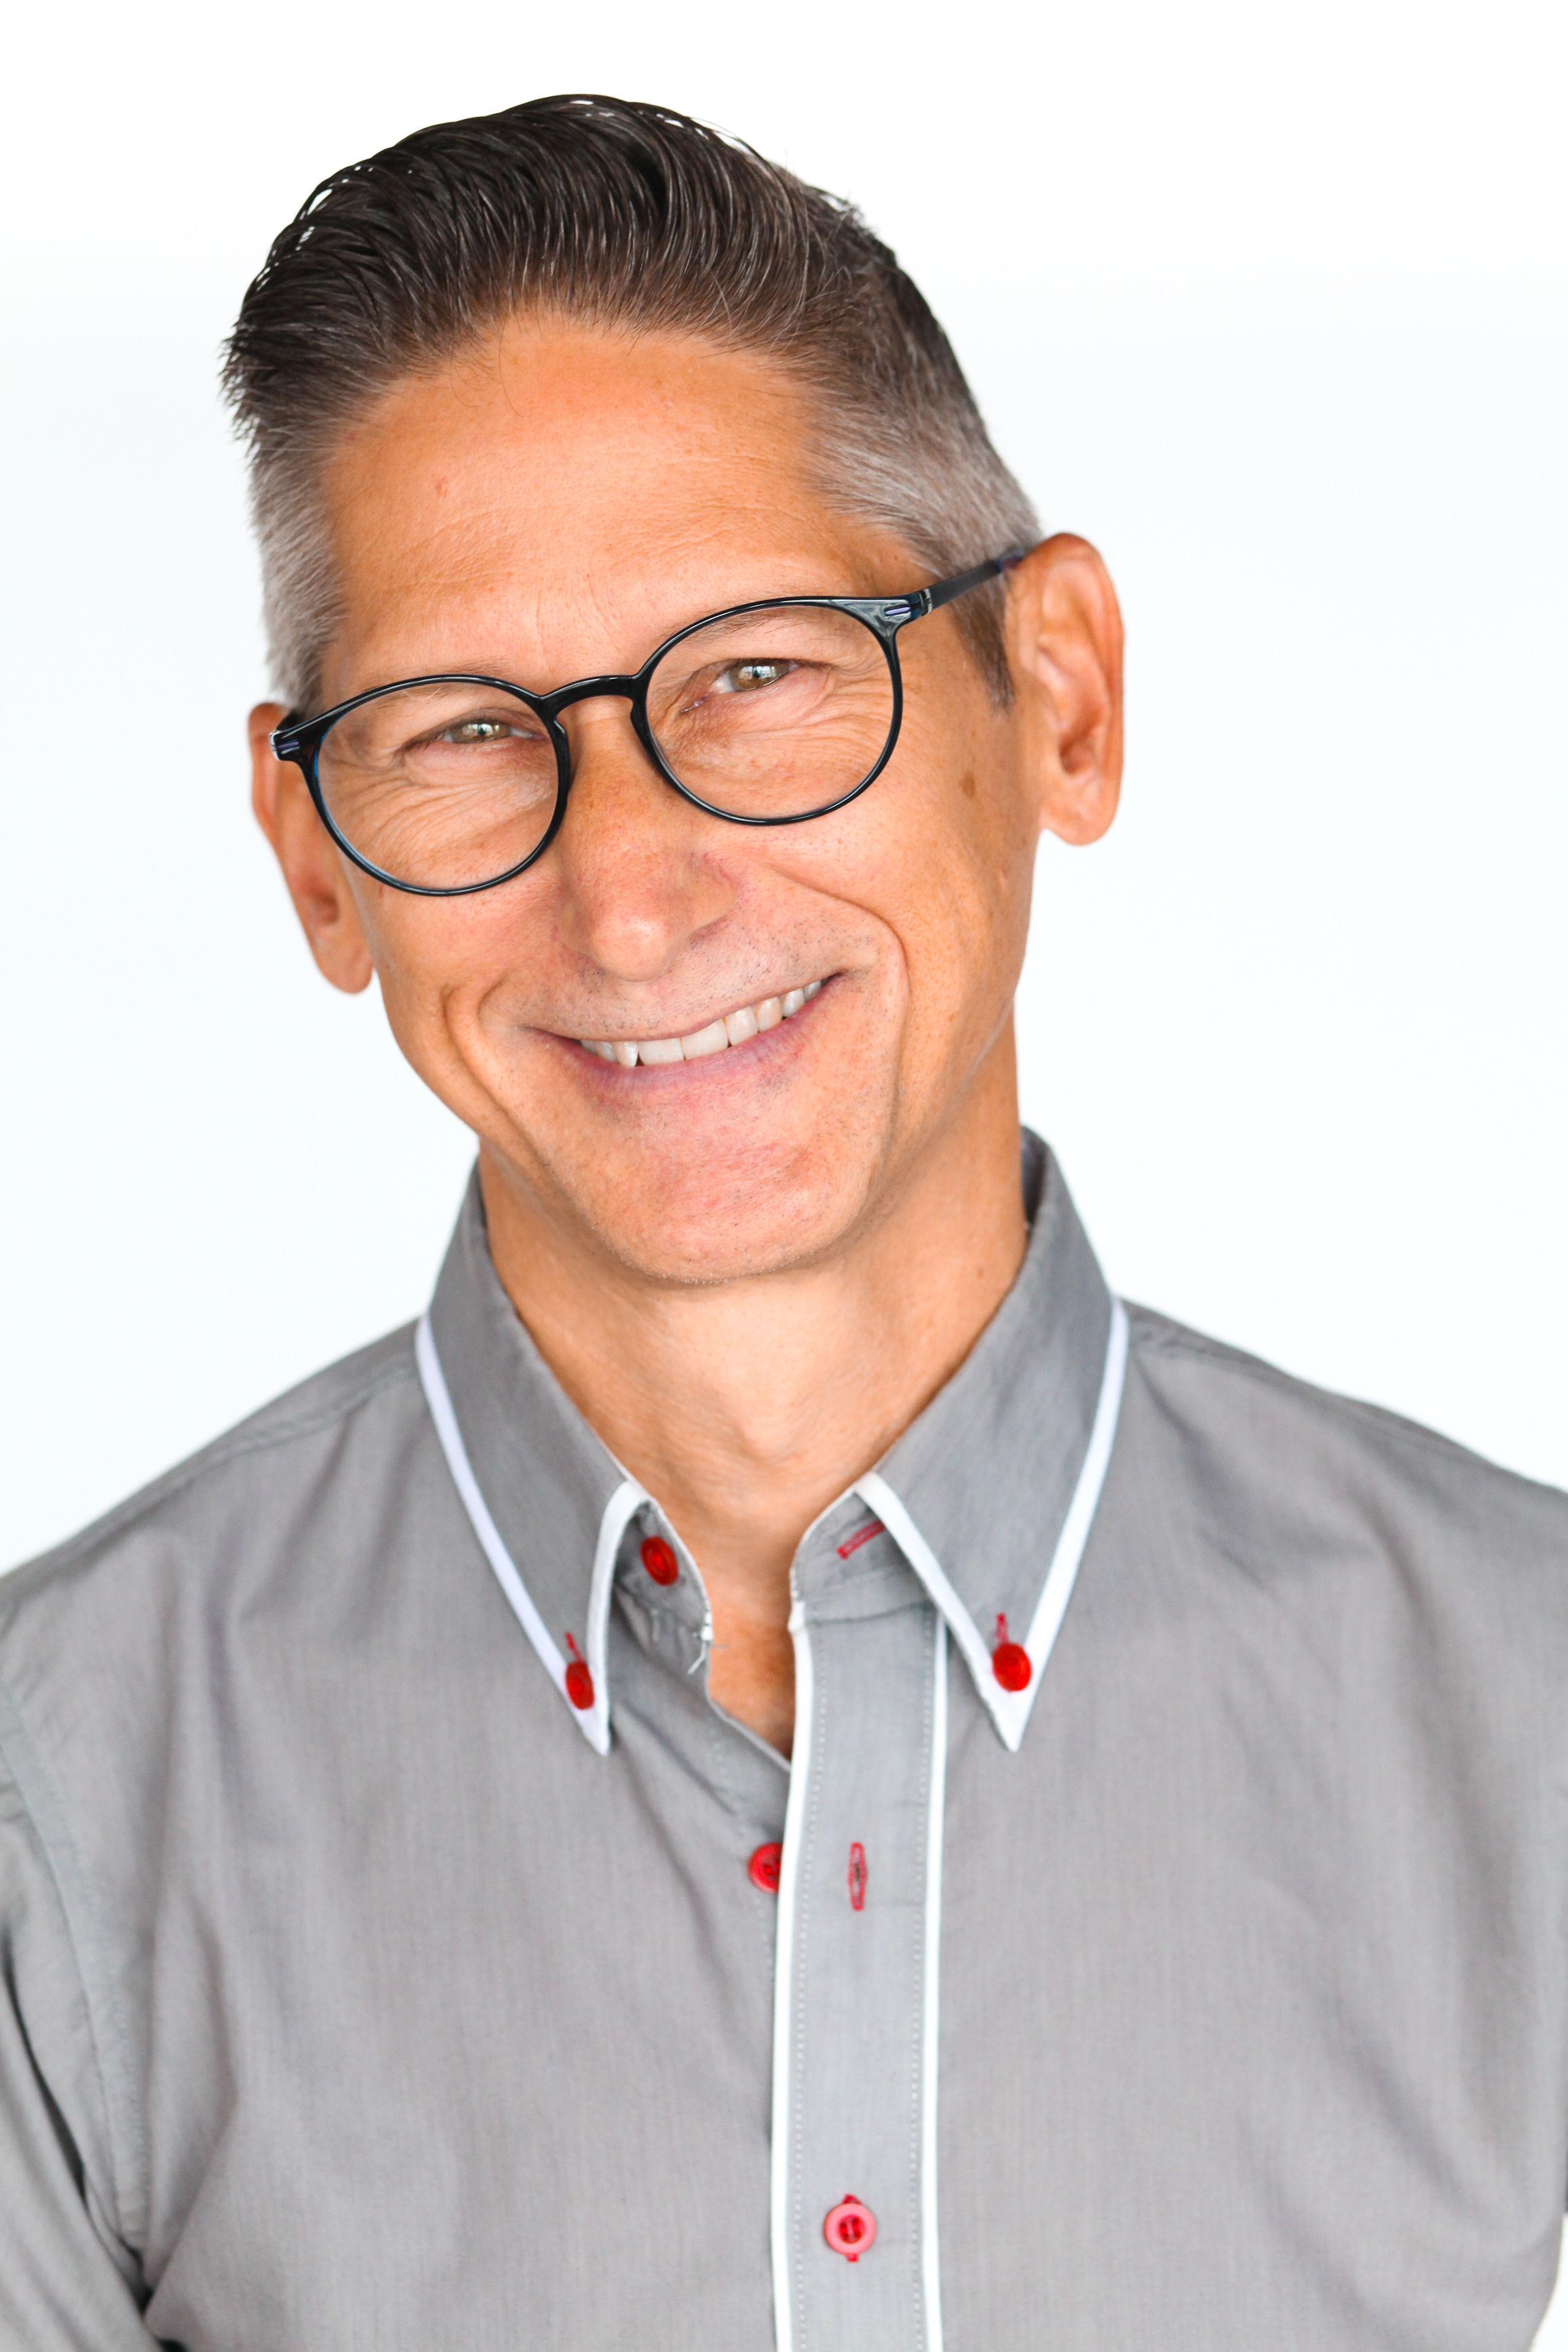 Marcello Lanfranchi